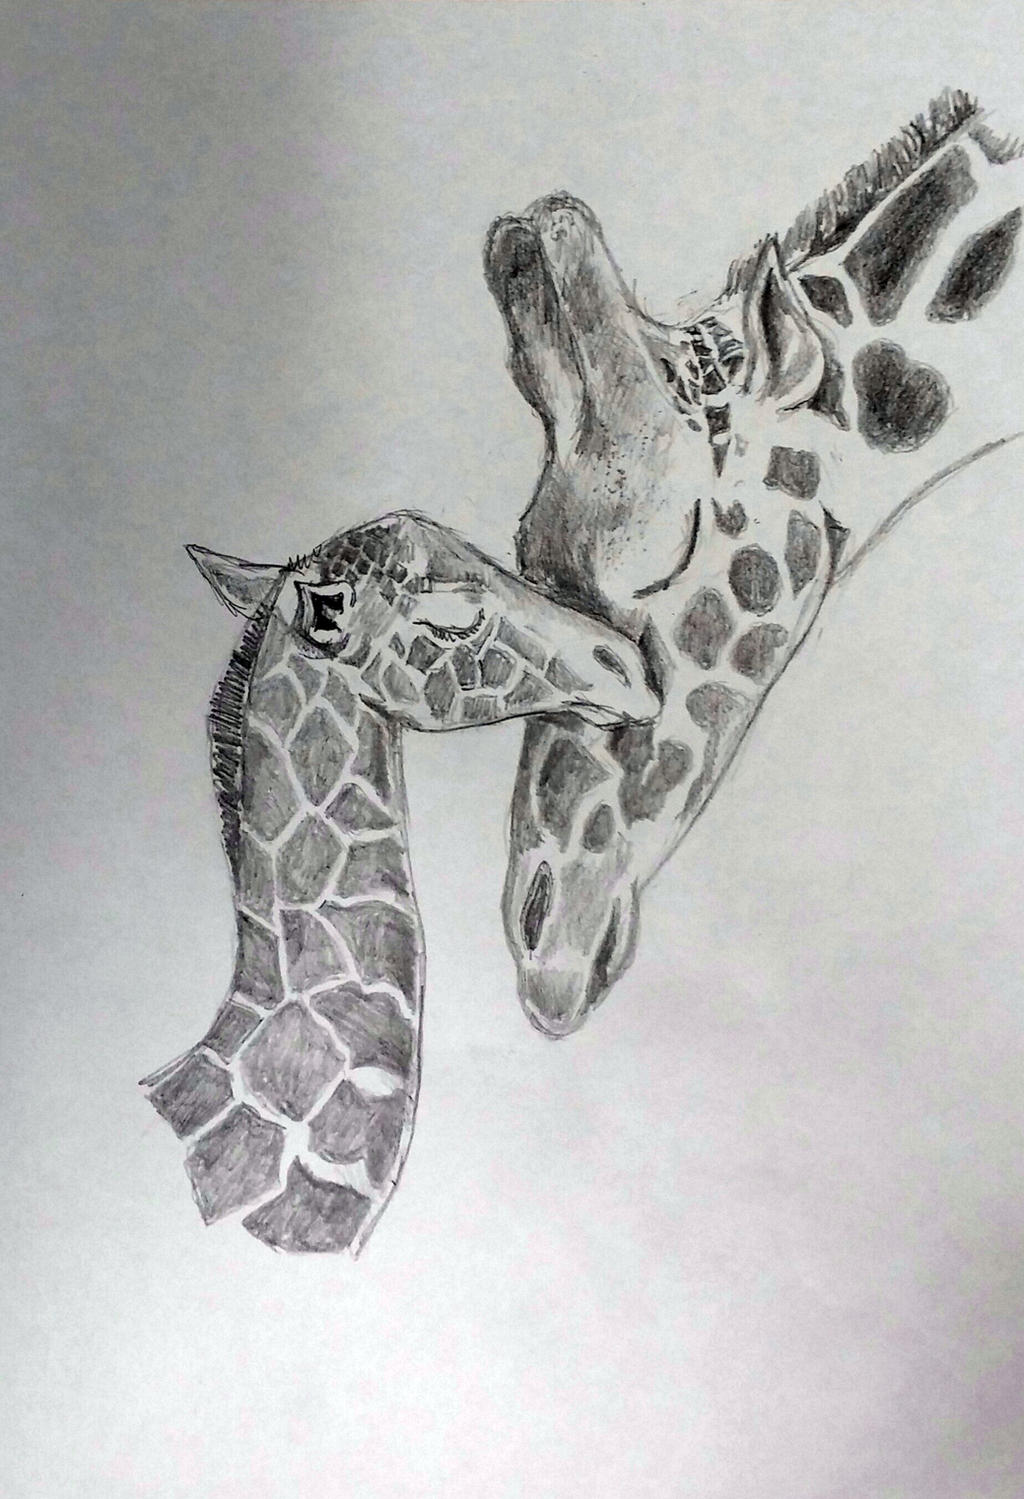 Uncategorized Giraffe Drawings giraffe baby and mom drawing 10 15 14 ver 2 by delenntoo on deviantart delenntoo